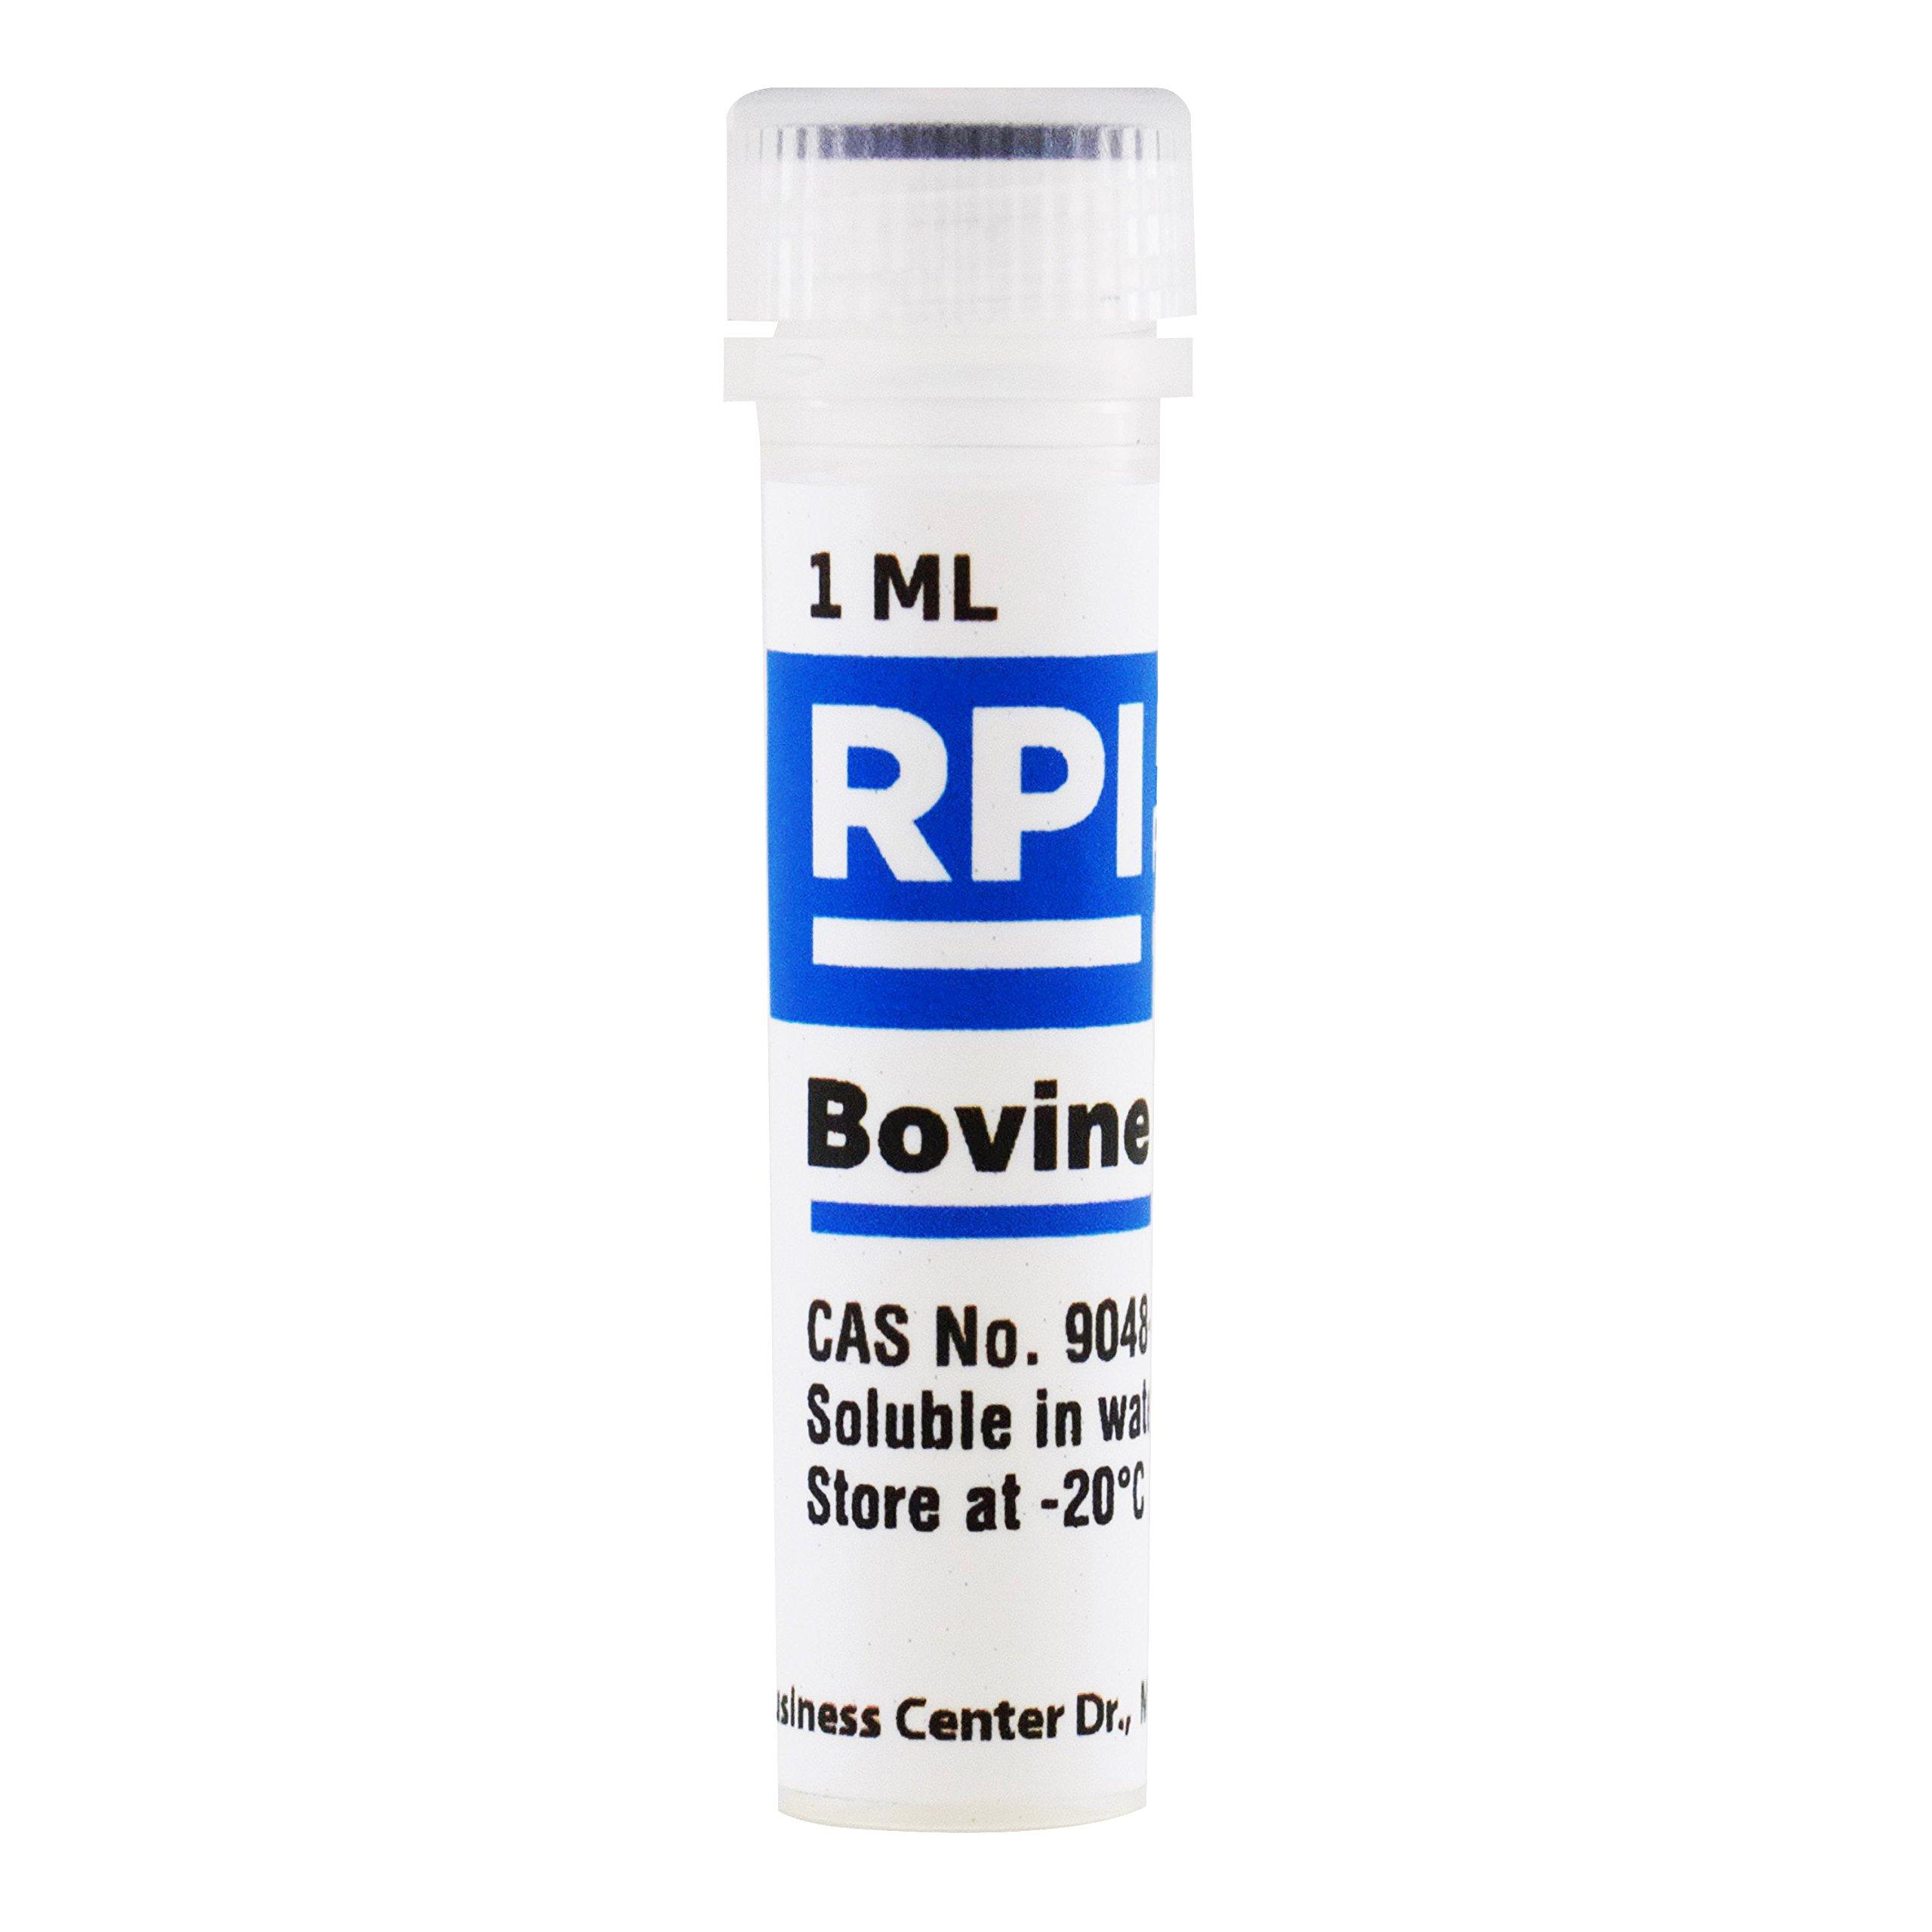 Bovine Serum Albumin Solution, 20mg/ml Solution, 1 Milliliter